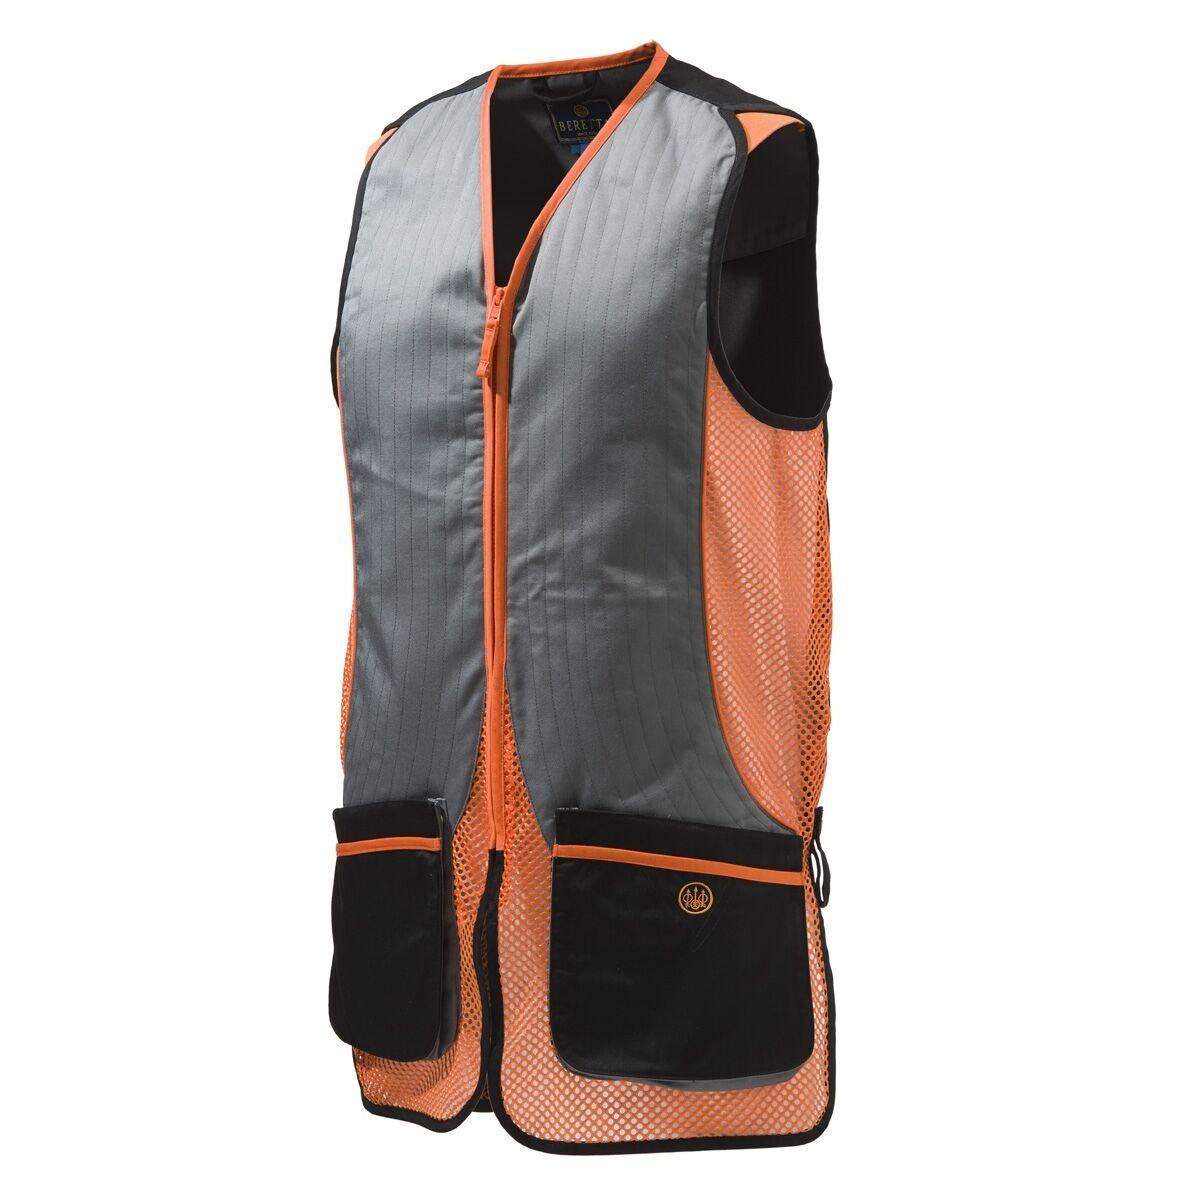 Para Hombre Tiro Chaleco  Beretta Plata Paloma-Negro naranja-todos Los Tamaños-Nuevo  exclusivo